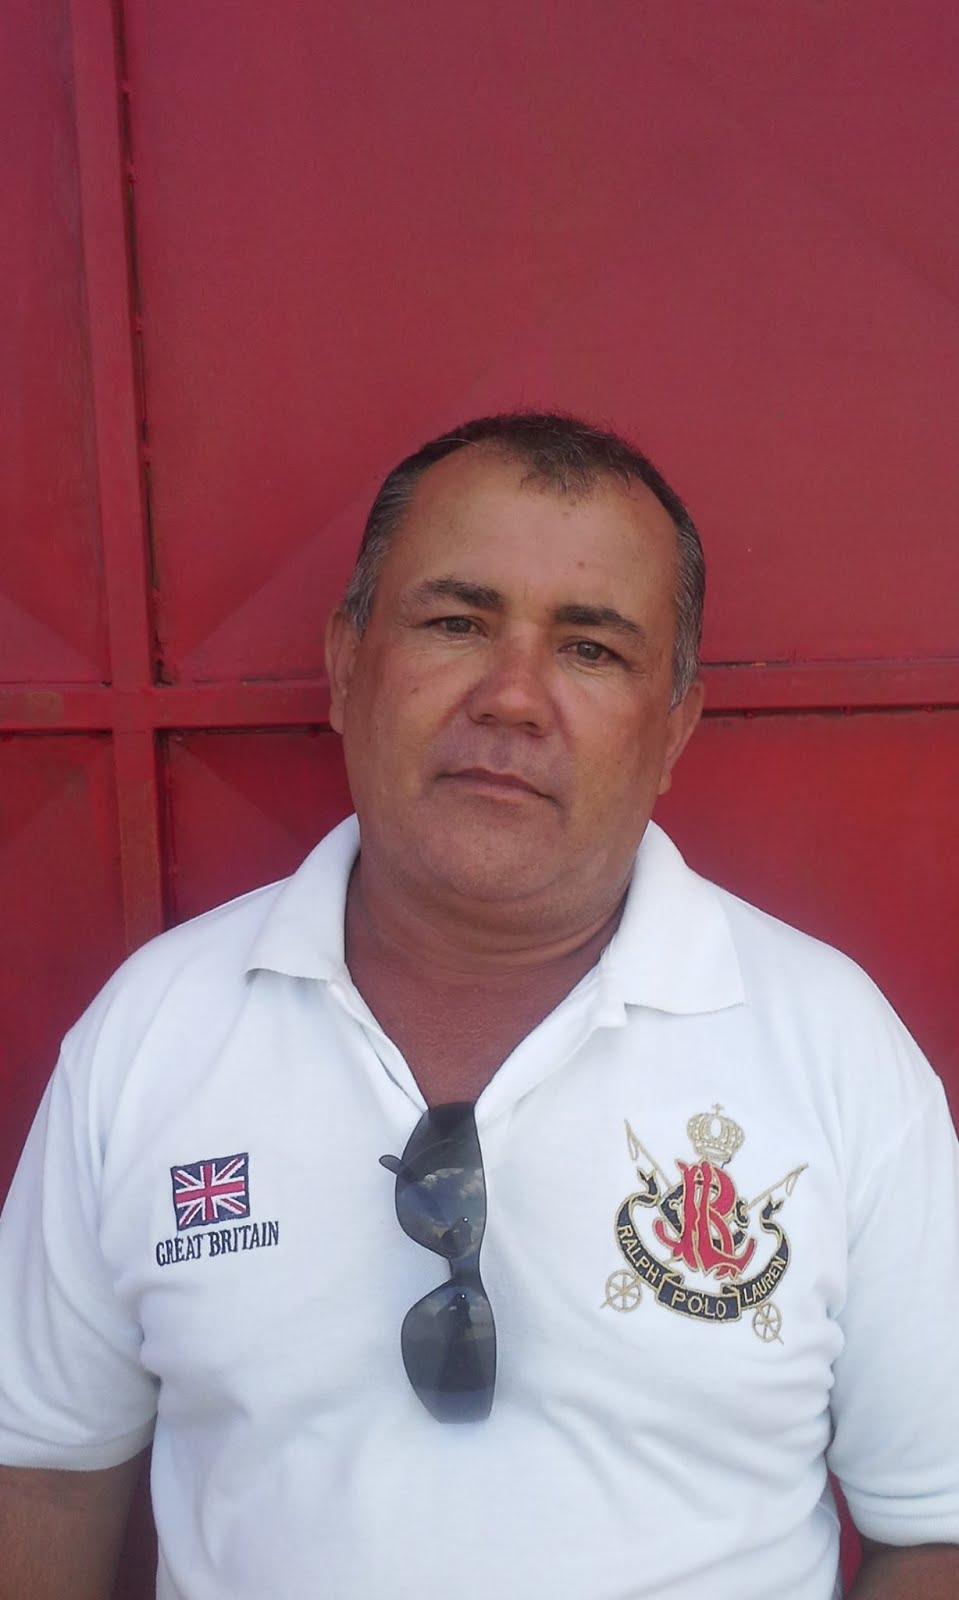 ERANDY ALVES